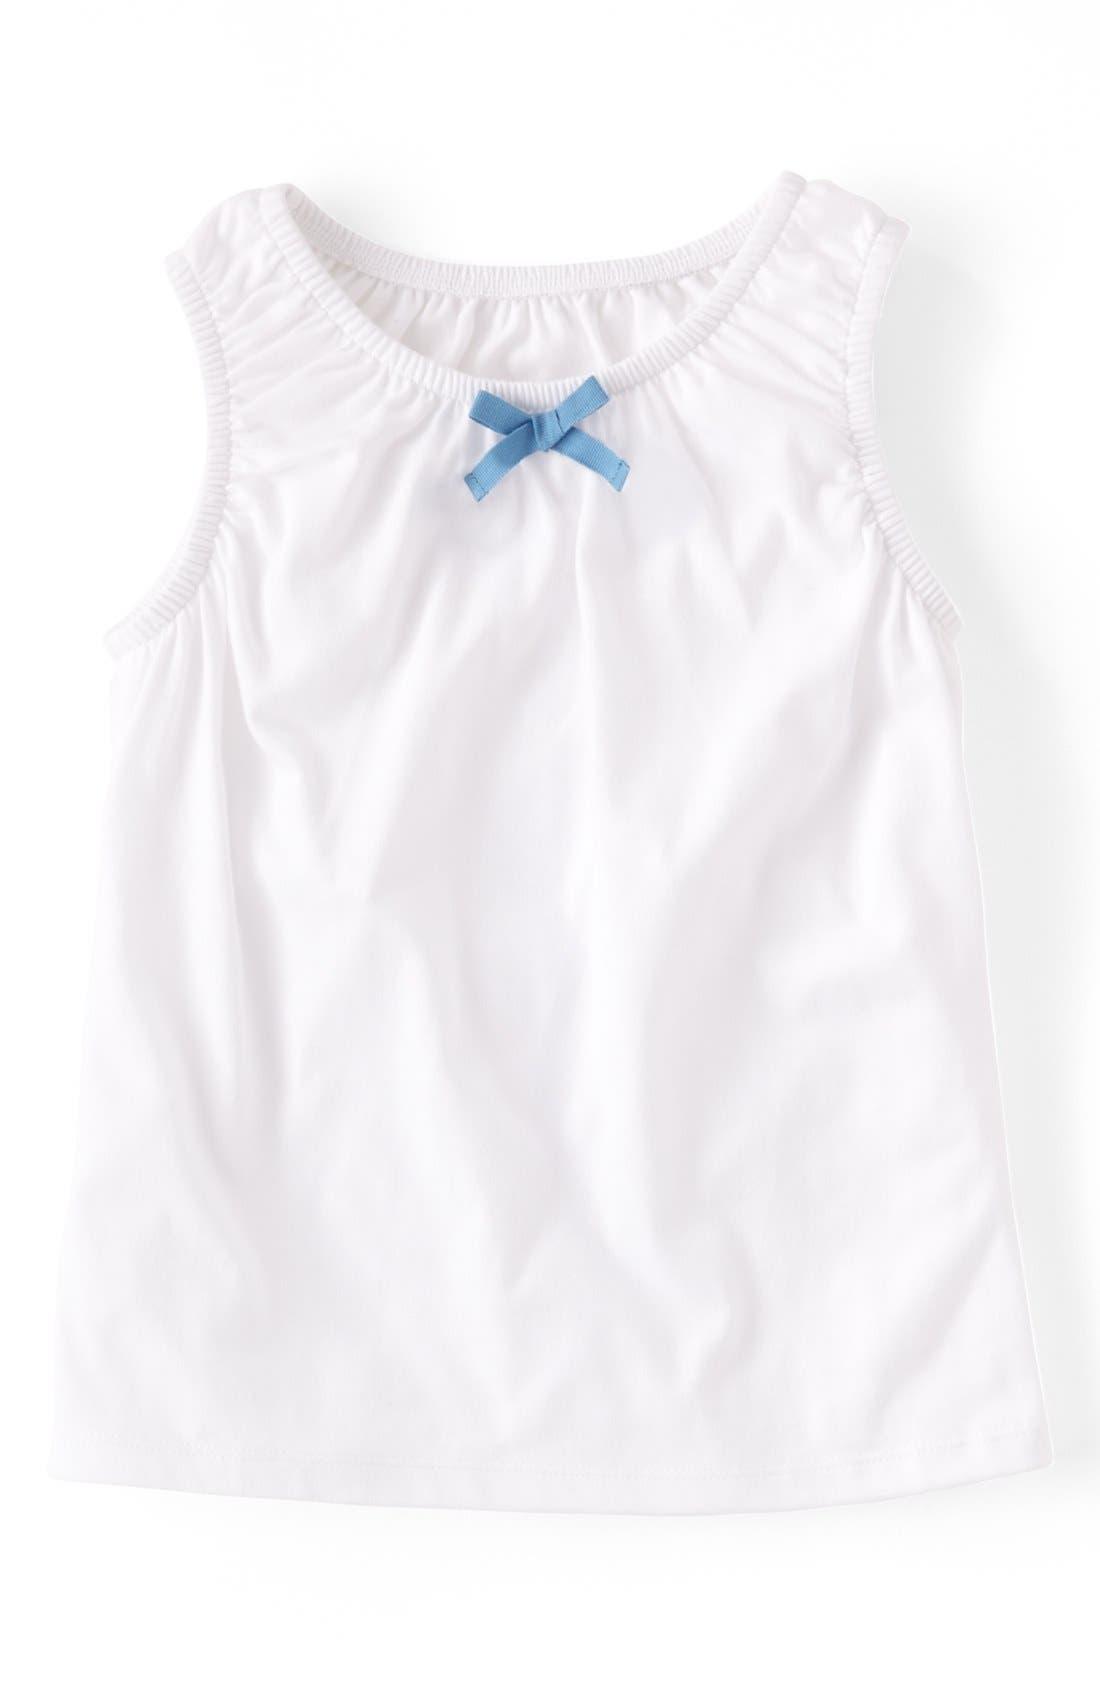 Alternate Image 1 Selected - Mini Boden 'Pretty' Tank Top (Toddler Girls, Little Girls & Big Girls)(Online Only)